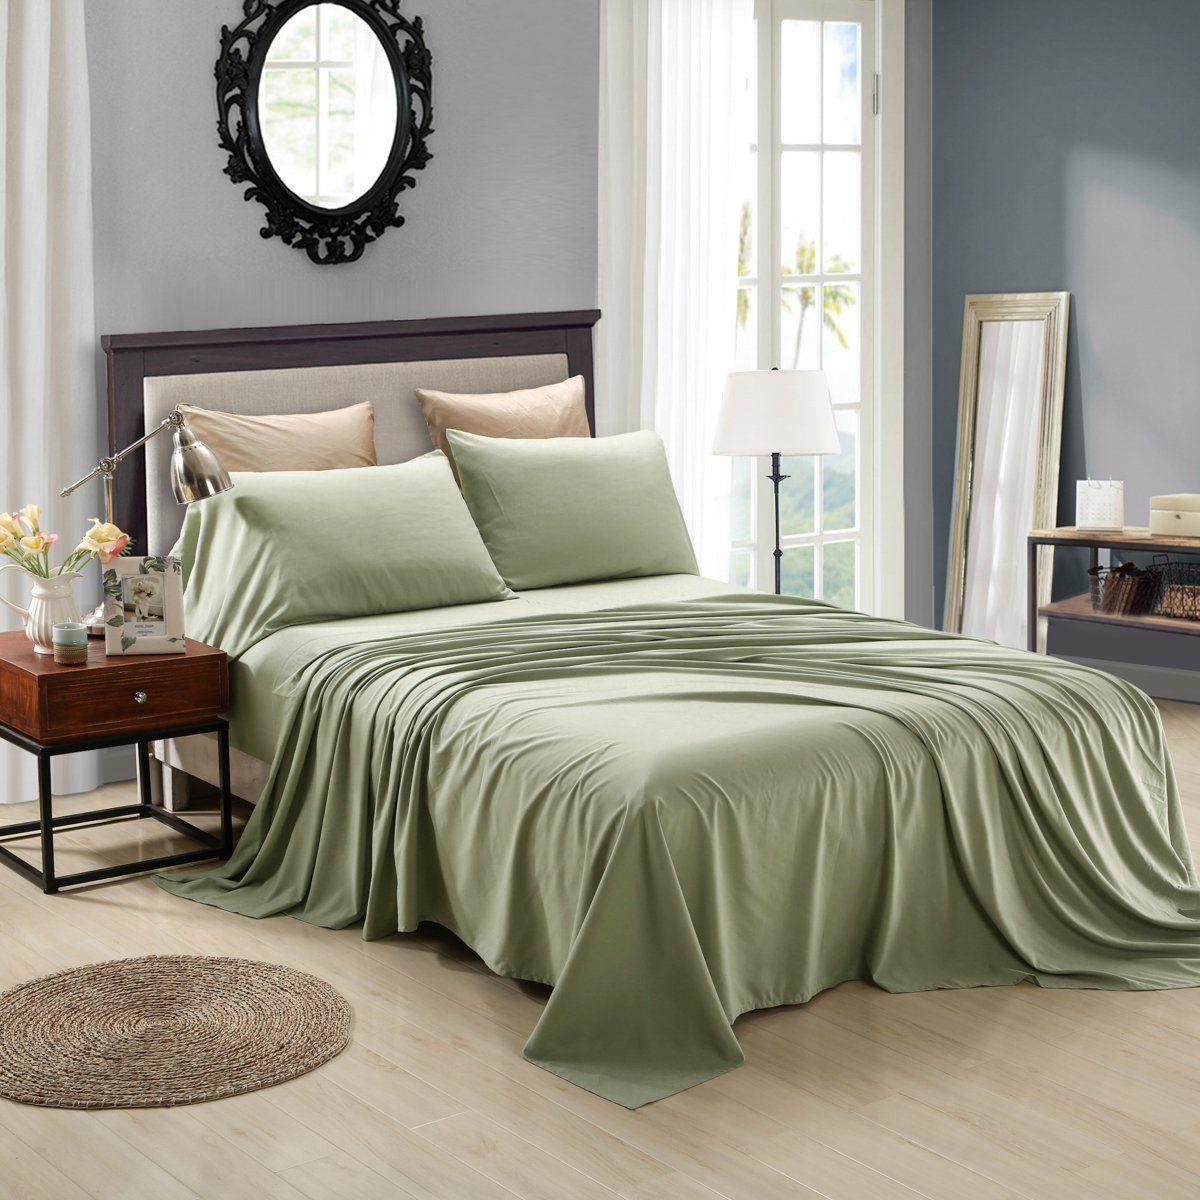 Honeymoon Extreme Soft 4pc Bed Sheet Set Sage Green 35 00